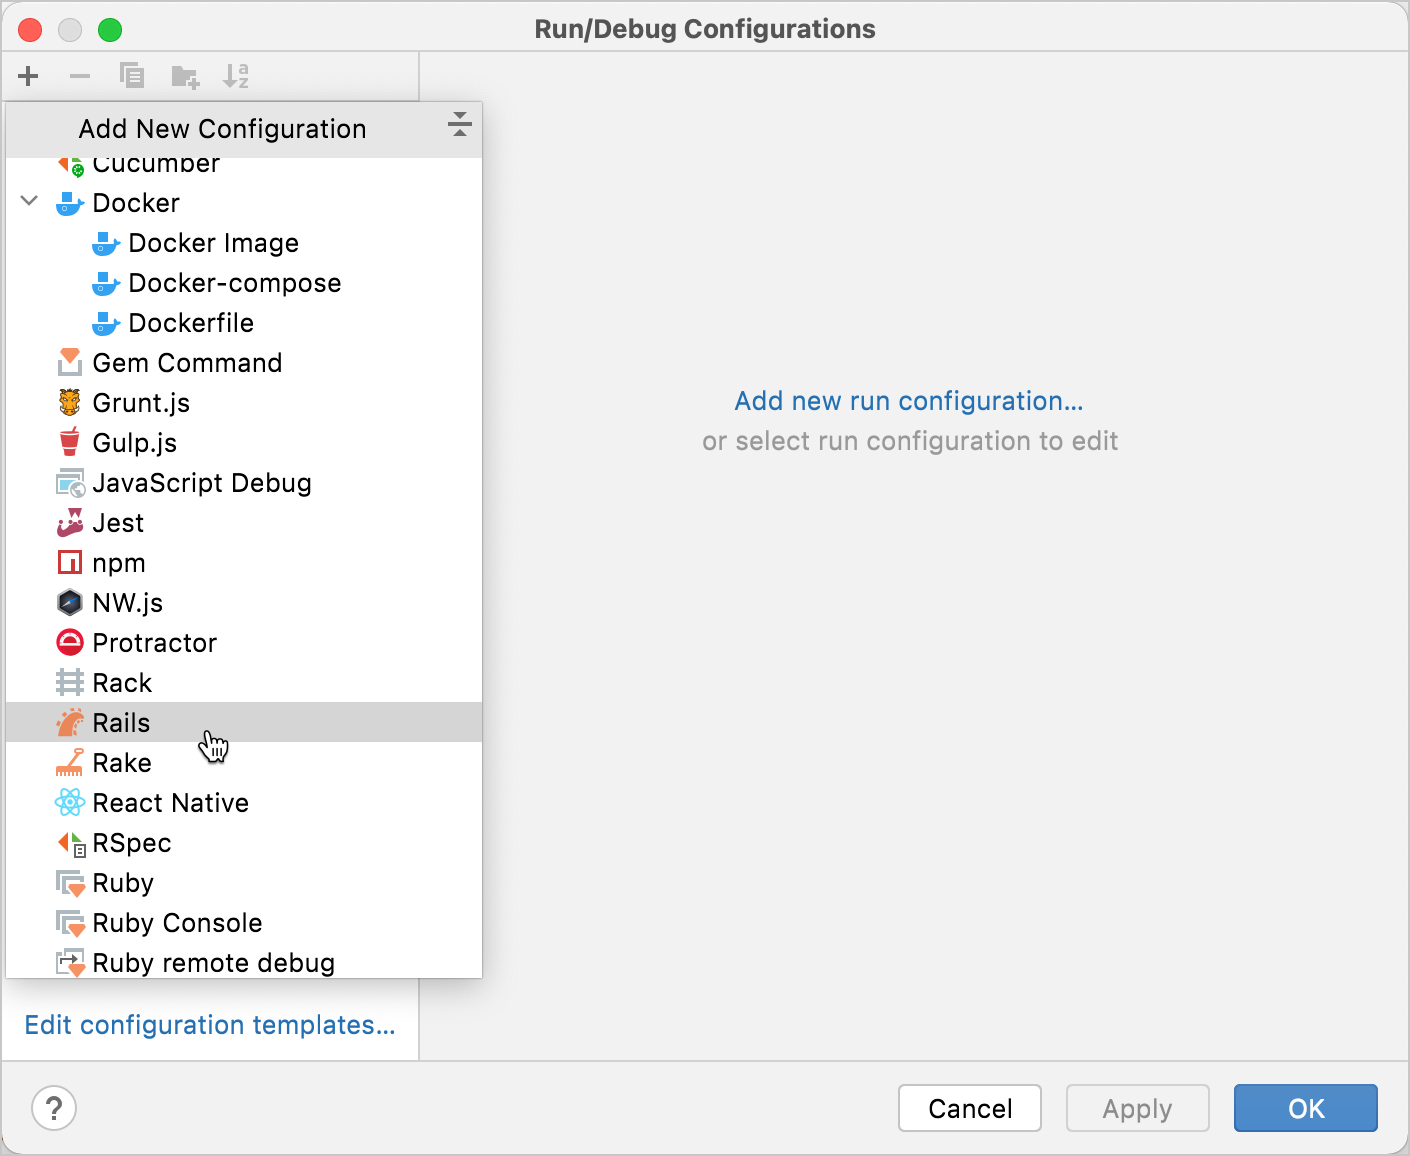 New run/debug configuration